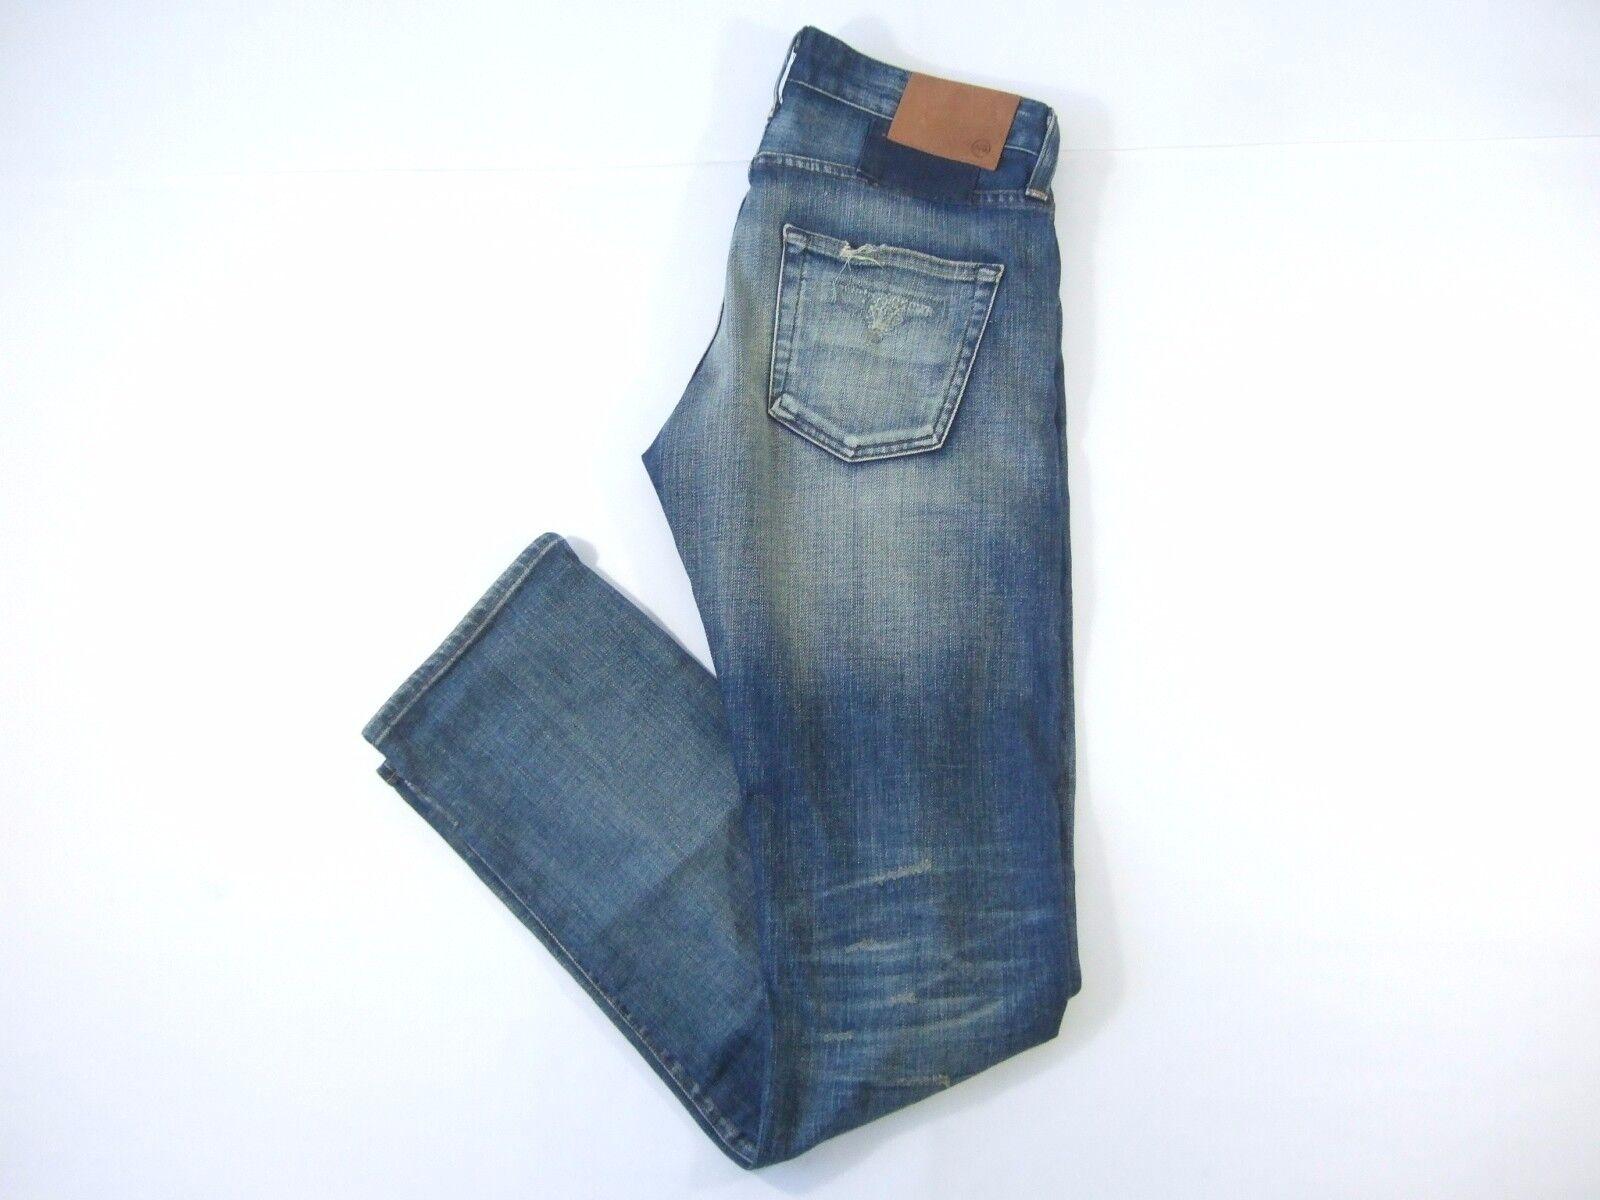 Adriano Goldshmeid USA The Matchbox Distressed Blau 30 Schmal Gerade Jeans Nwt